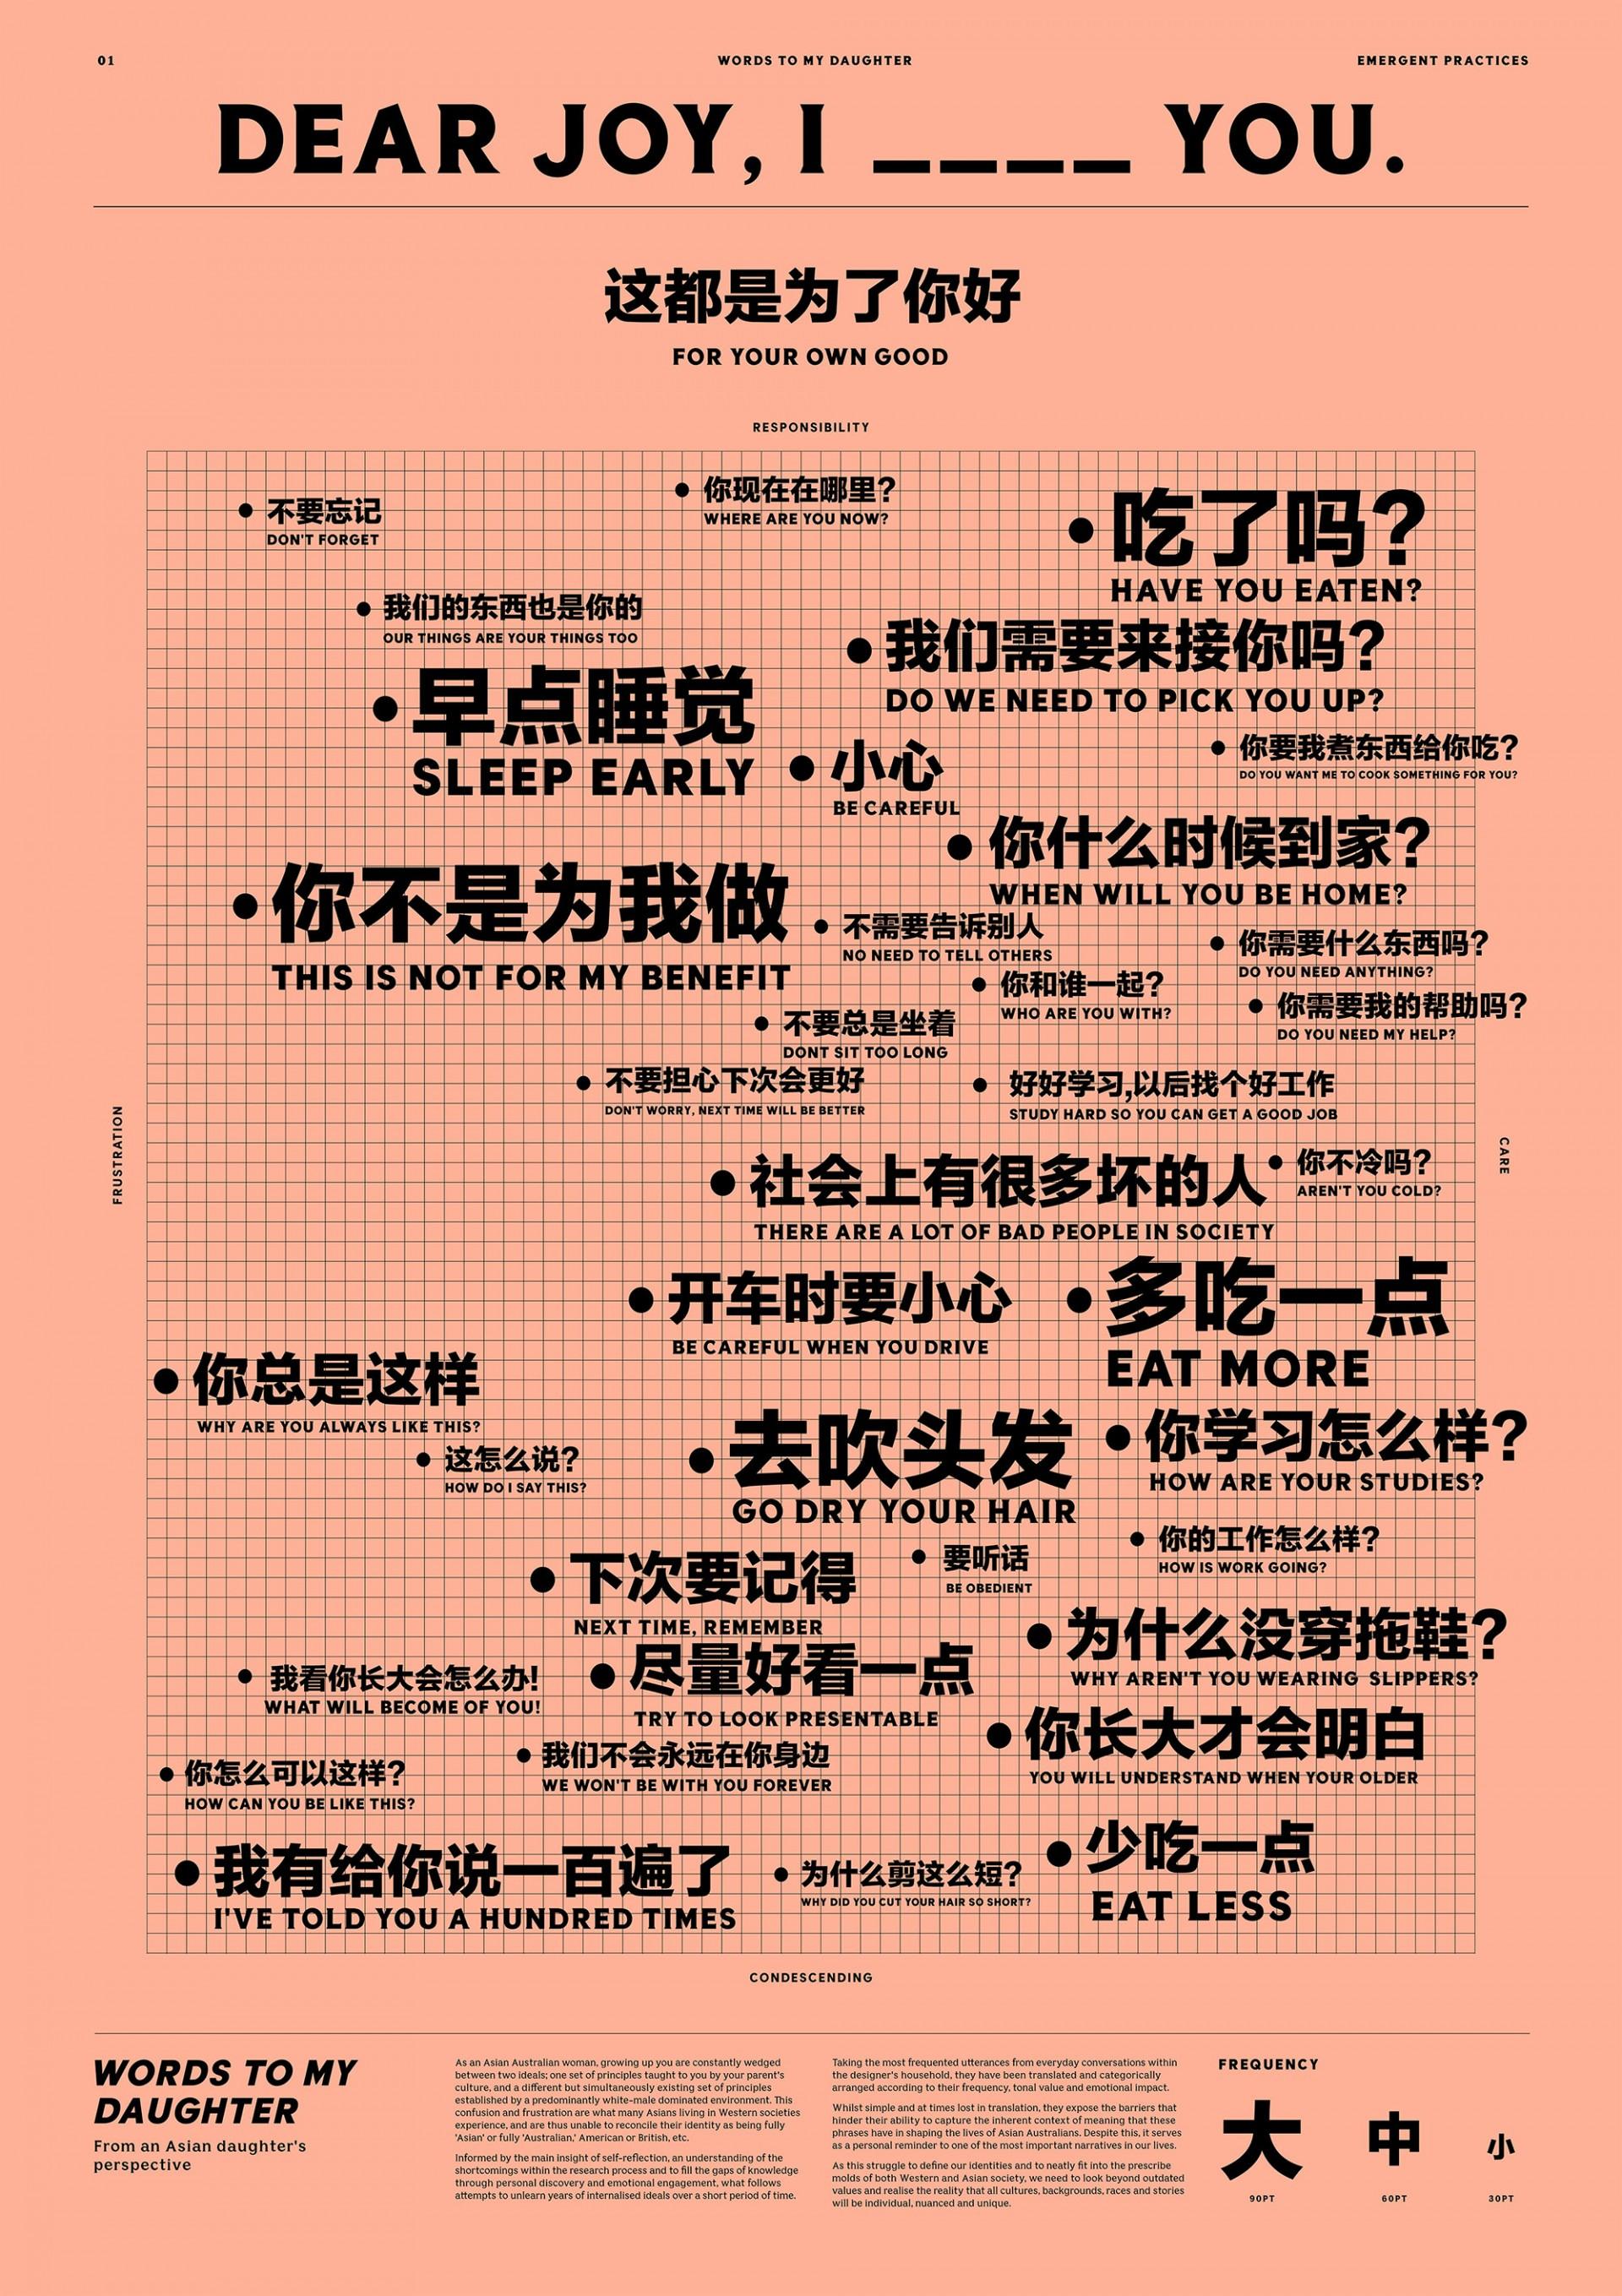 JoyLi_Poster_1.jpg